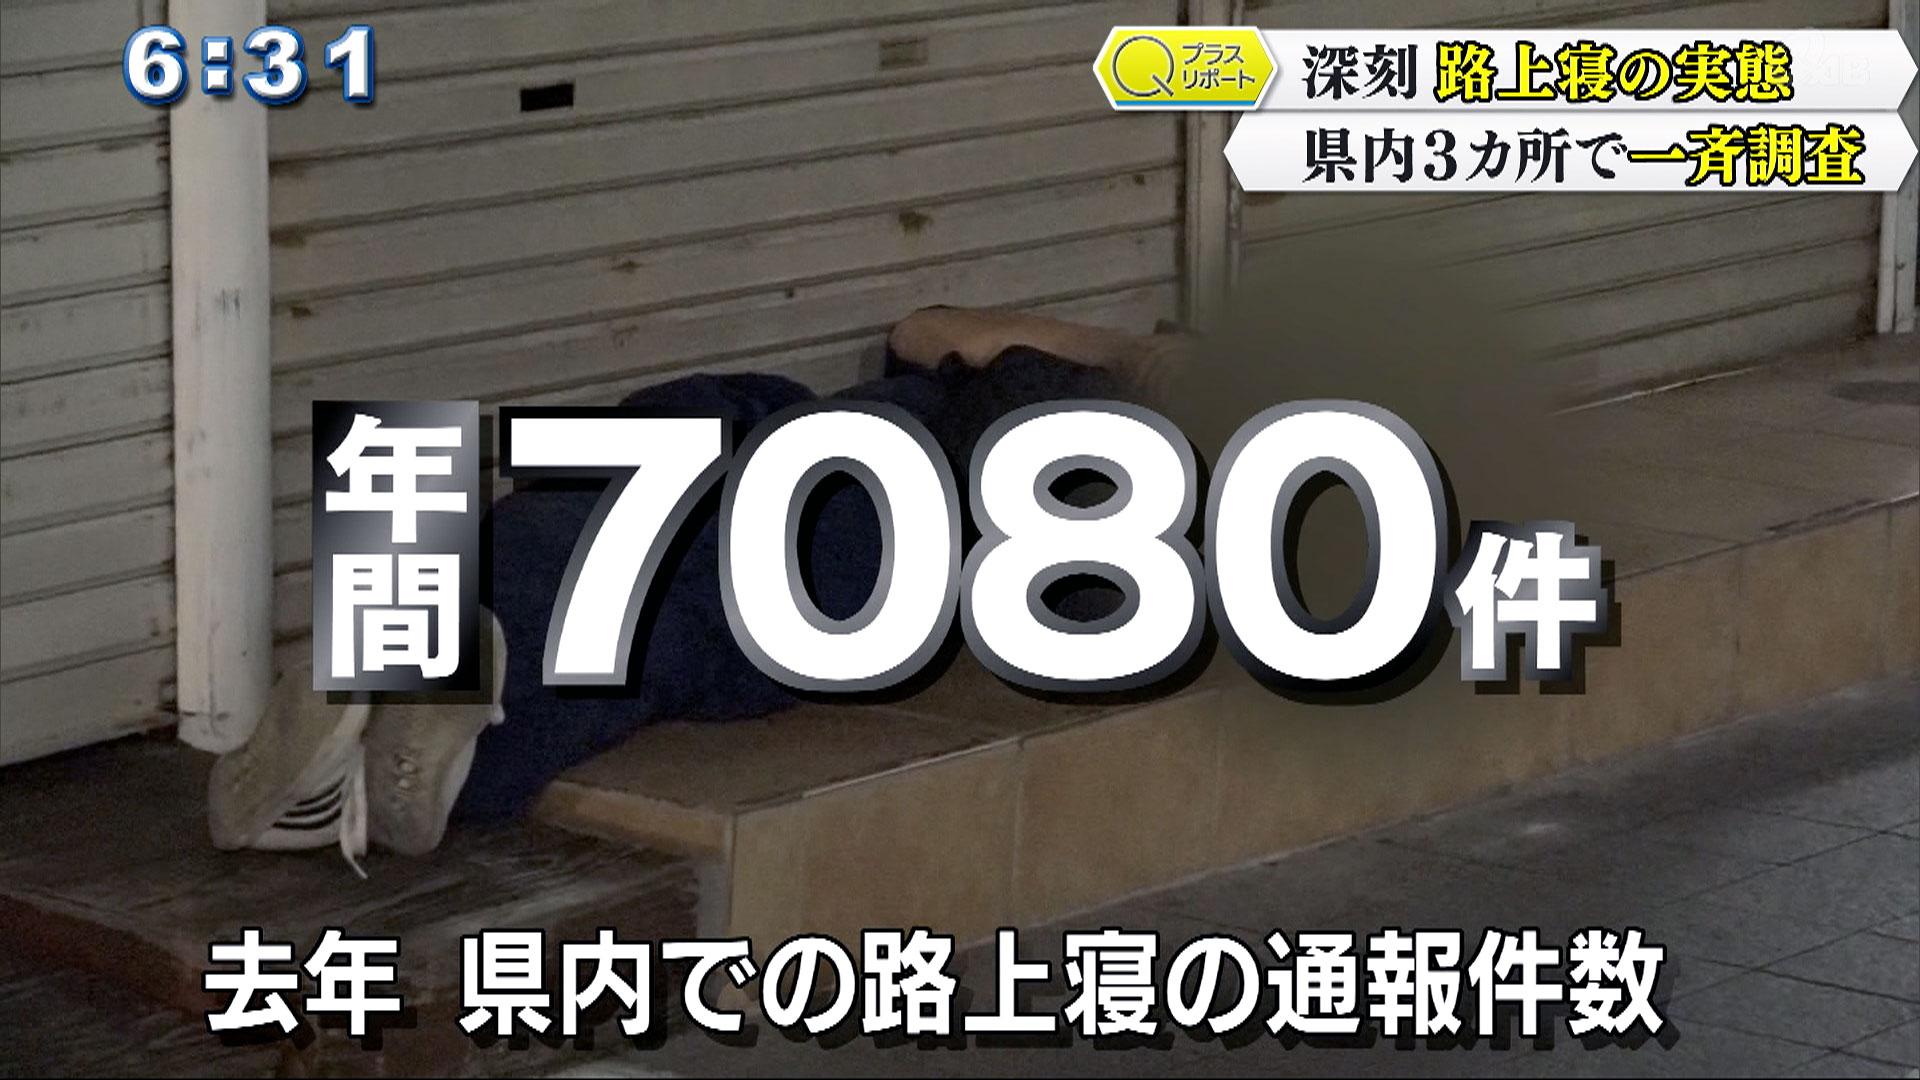 Qプラスリポート 沖縄の社会問題「路上寝」の実態 一斉調査